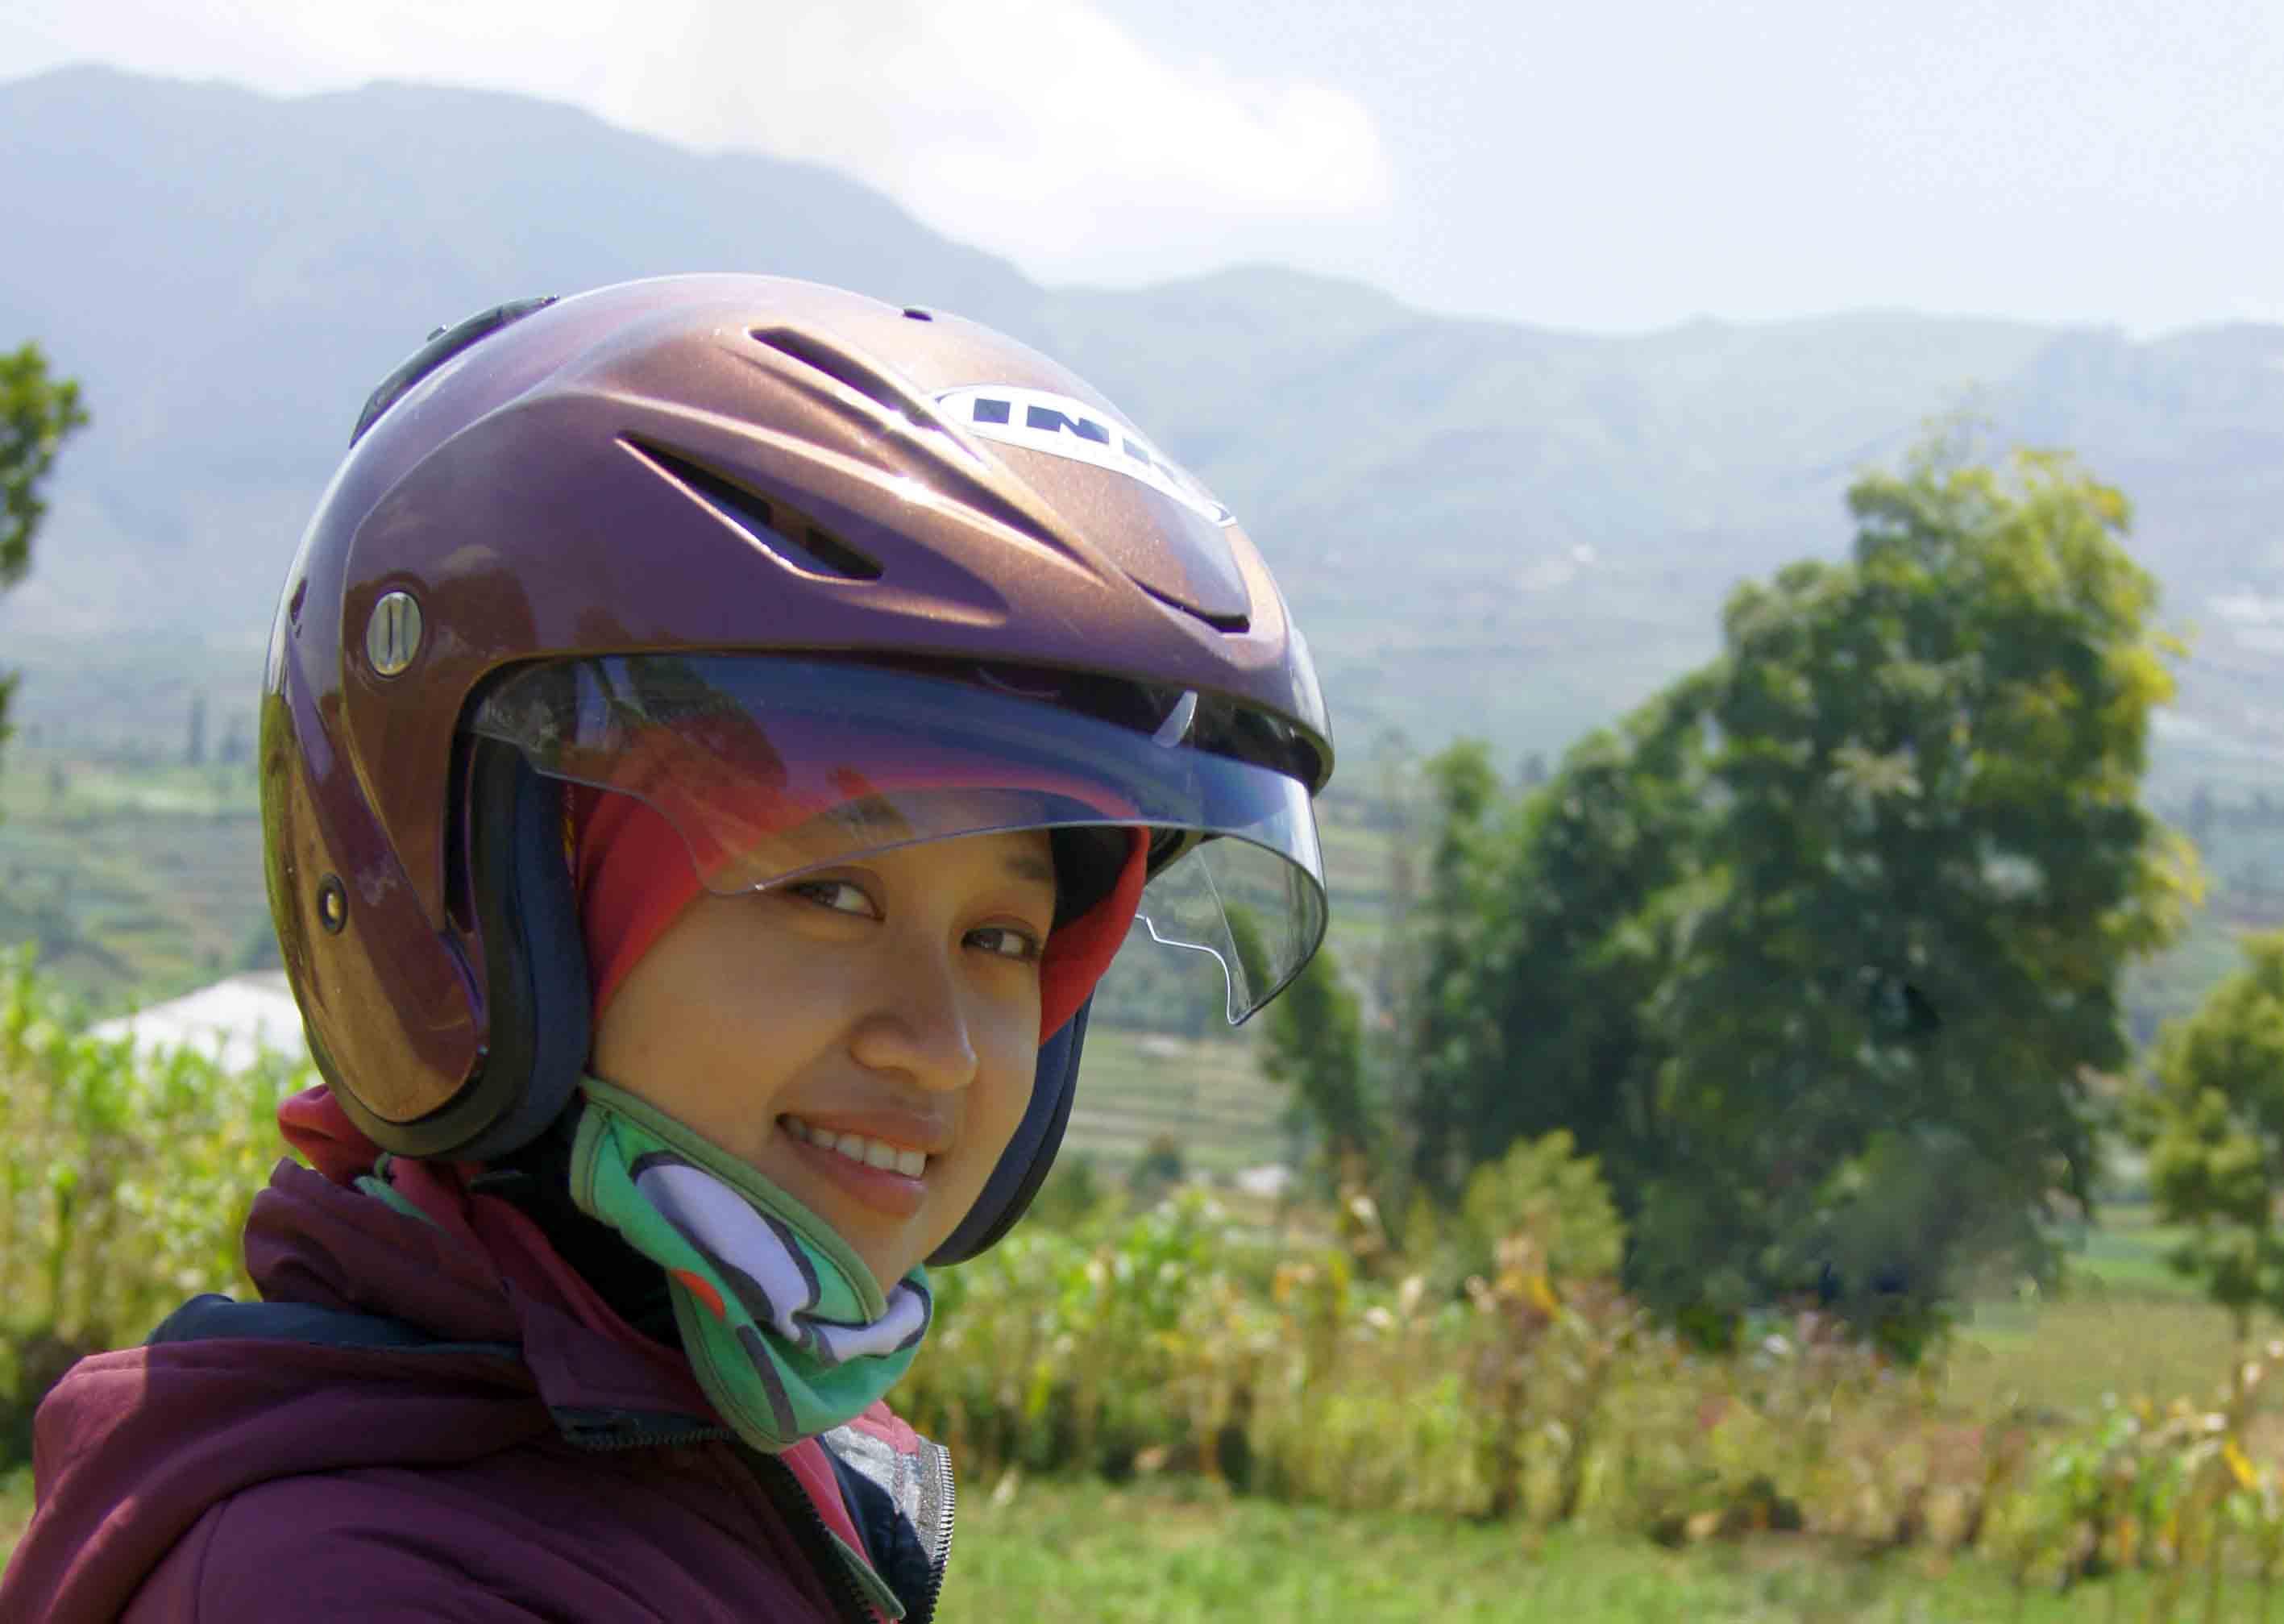 Tips Berpetualang Backpacker Khusus Para Gadis Coretanpetualangs Helm Cantik Memakai Untuk Keselamatan Diri